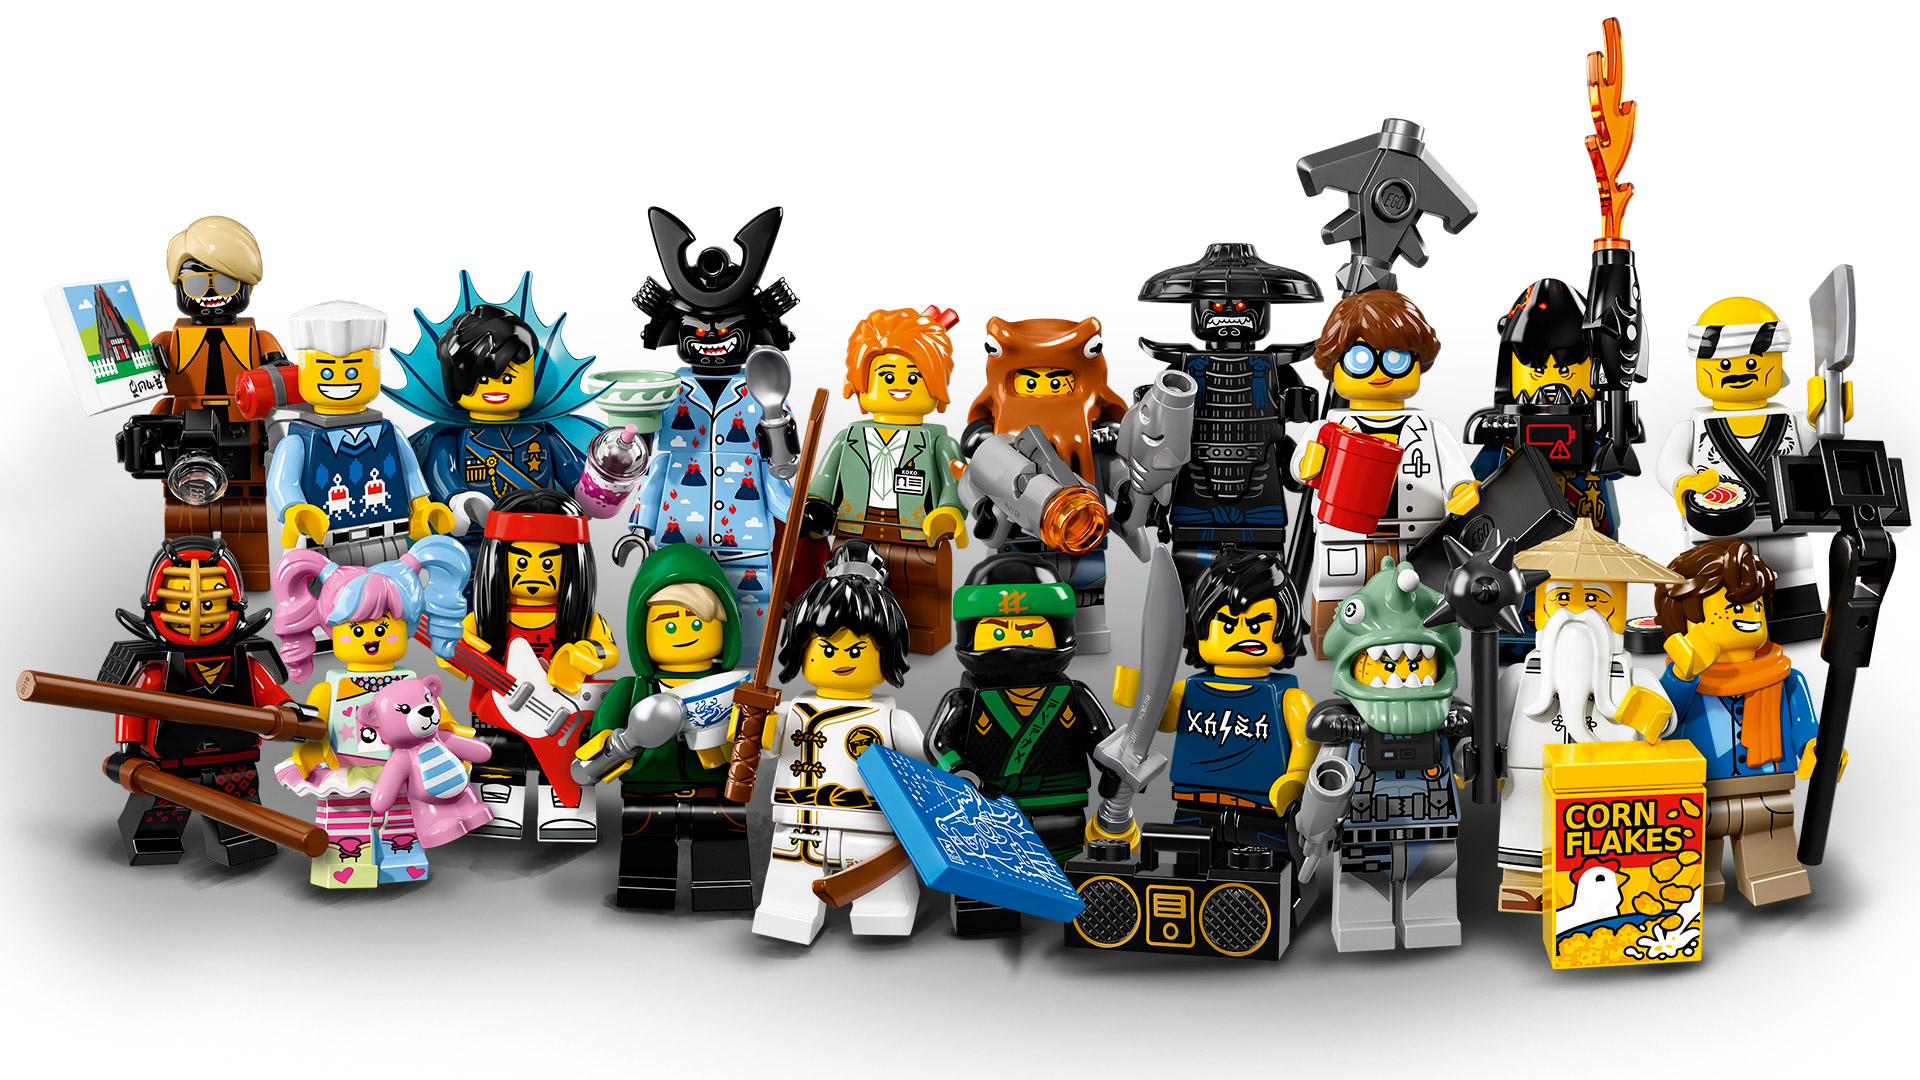 71019 The LEGO Ninjago Movie Series | Ninjago Wiki | FANDOM powered ...